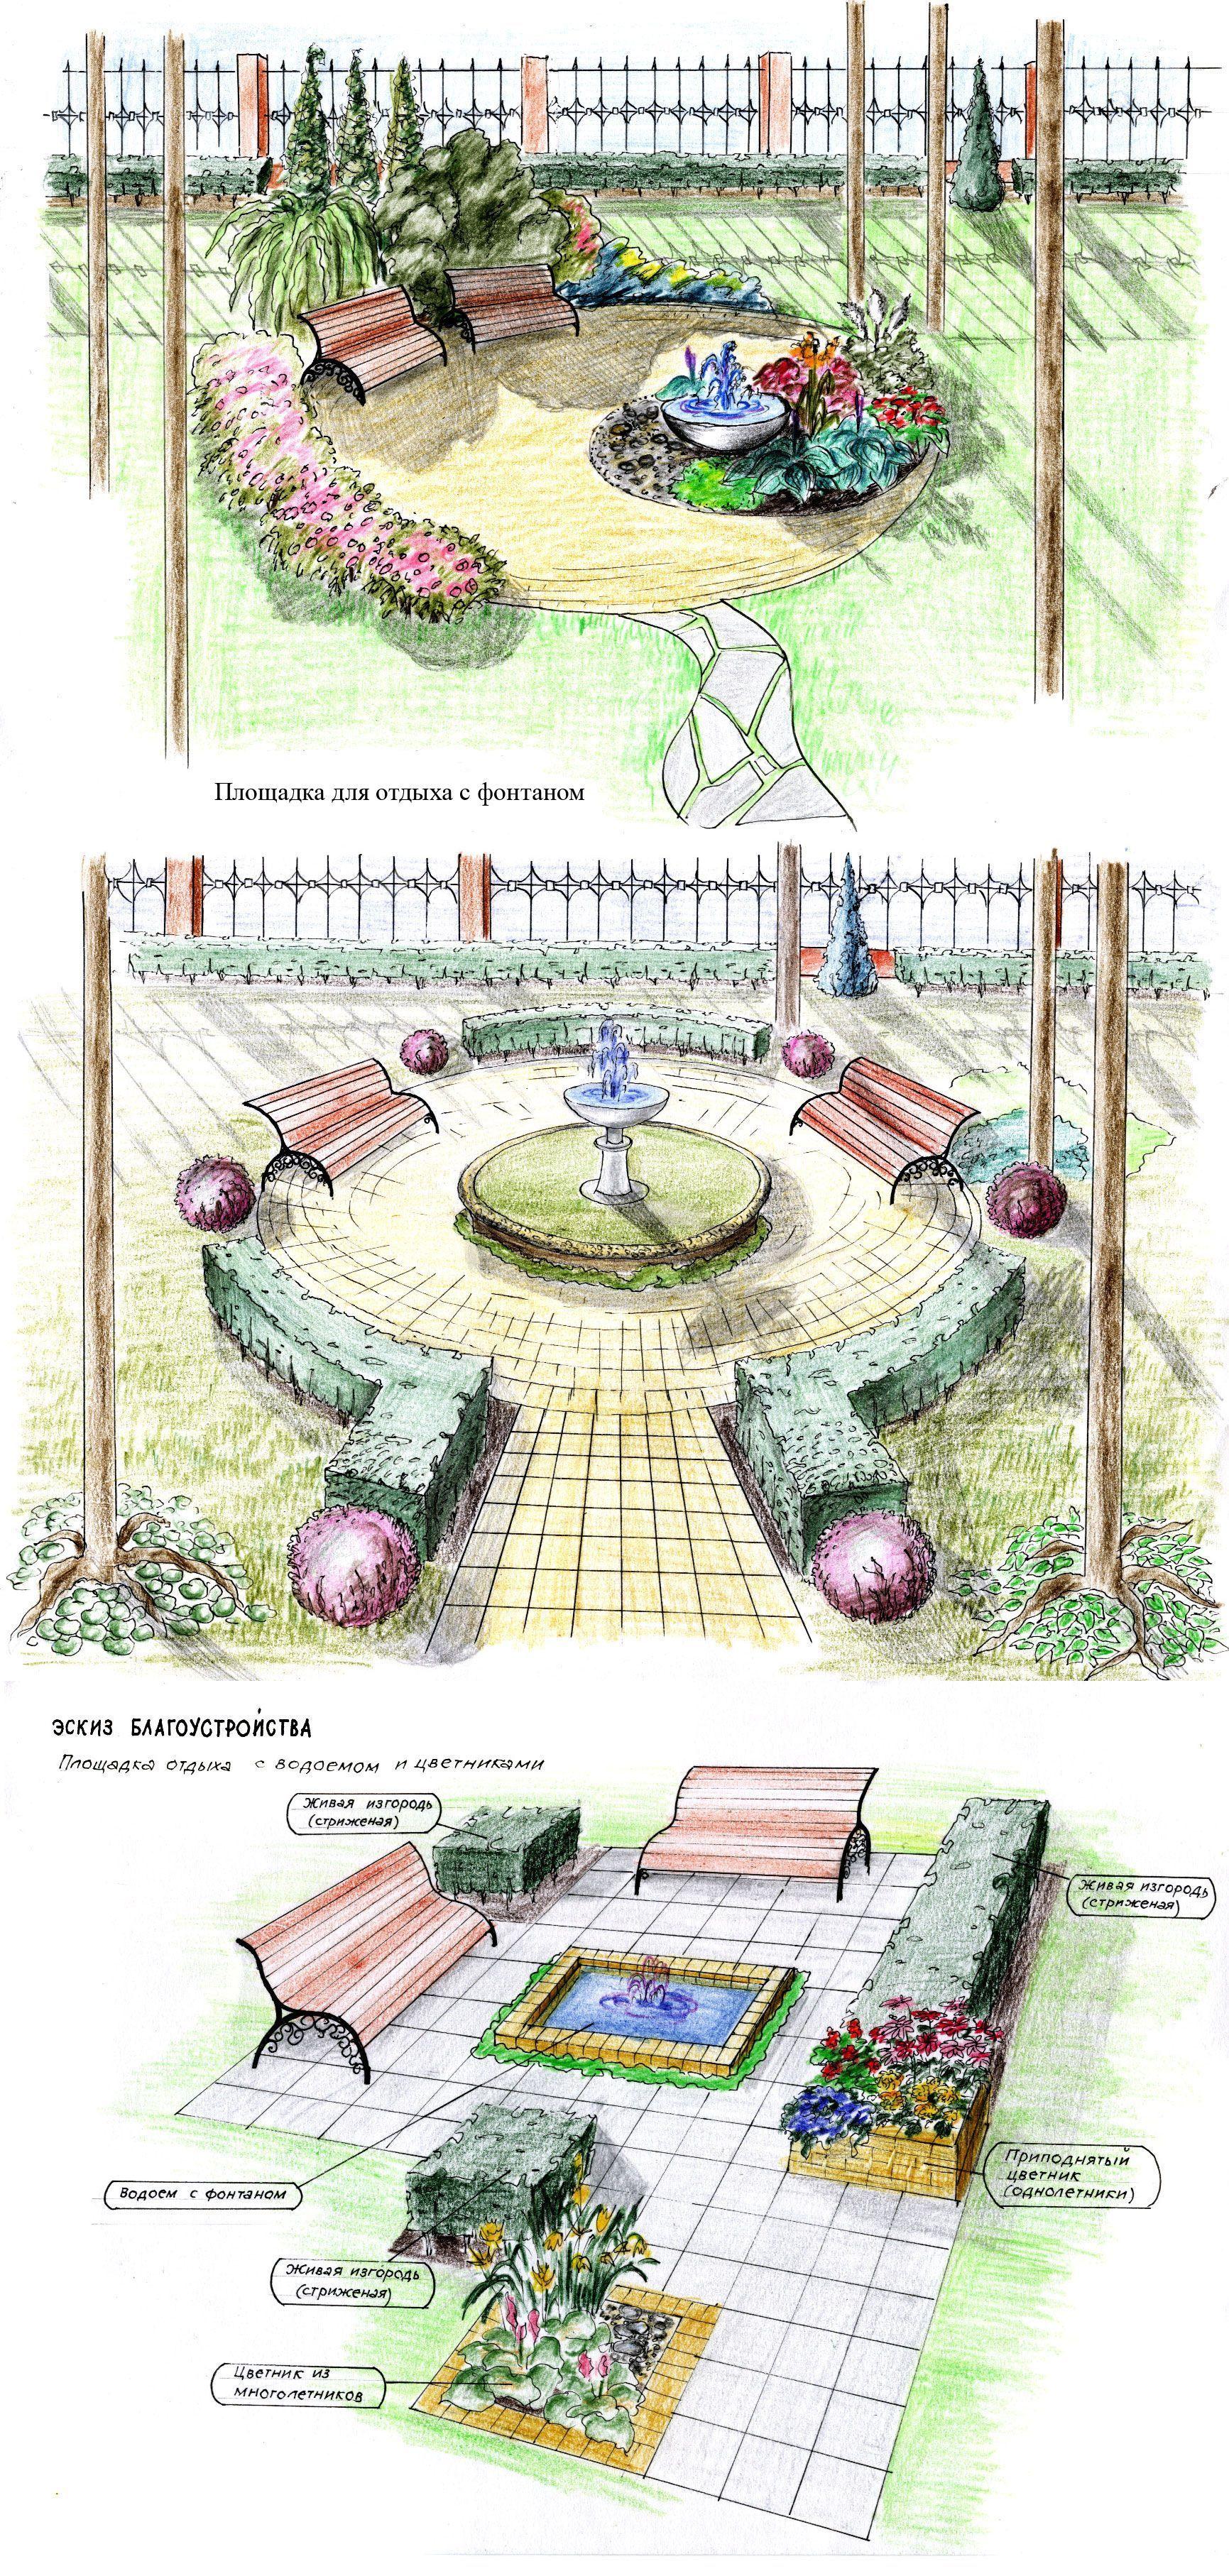 Establishing Backyard Landscaping Ideas Could Feel Like A Huge Task But Coming Up With Excel Garden Design Plans Landscape Plans Landscape Architecture Design